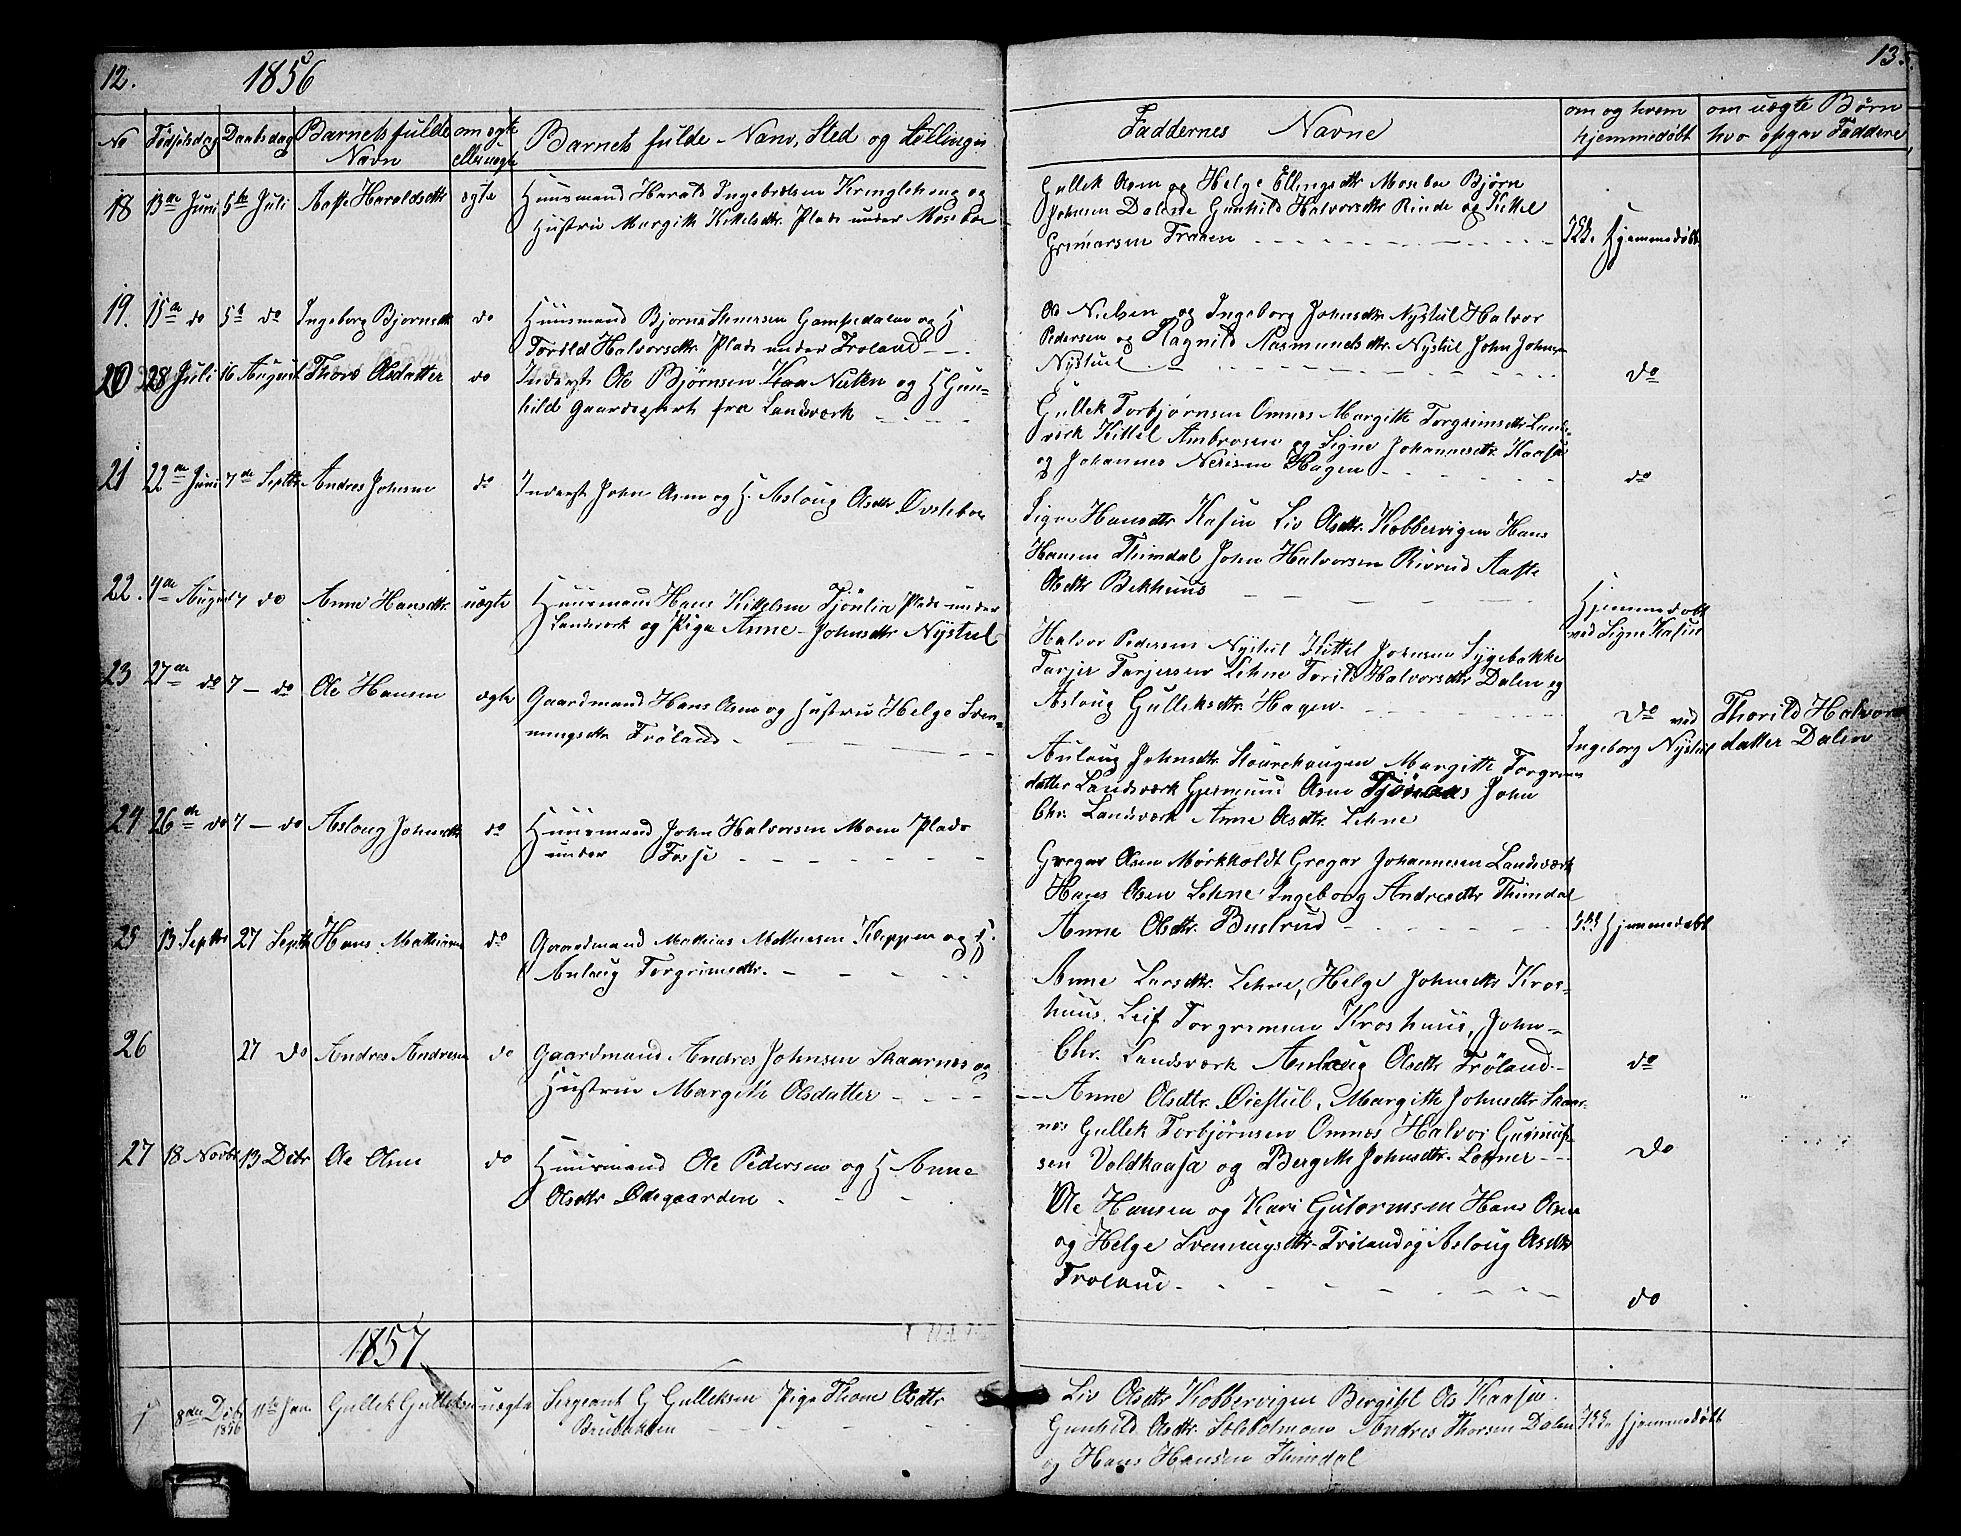 SAKO, Hjartdal kirkebøker, G/Gb/L0002: Klokkerbok nr. II 2, 1854-1884, s. 12-13